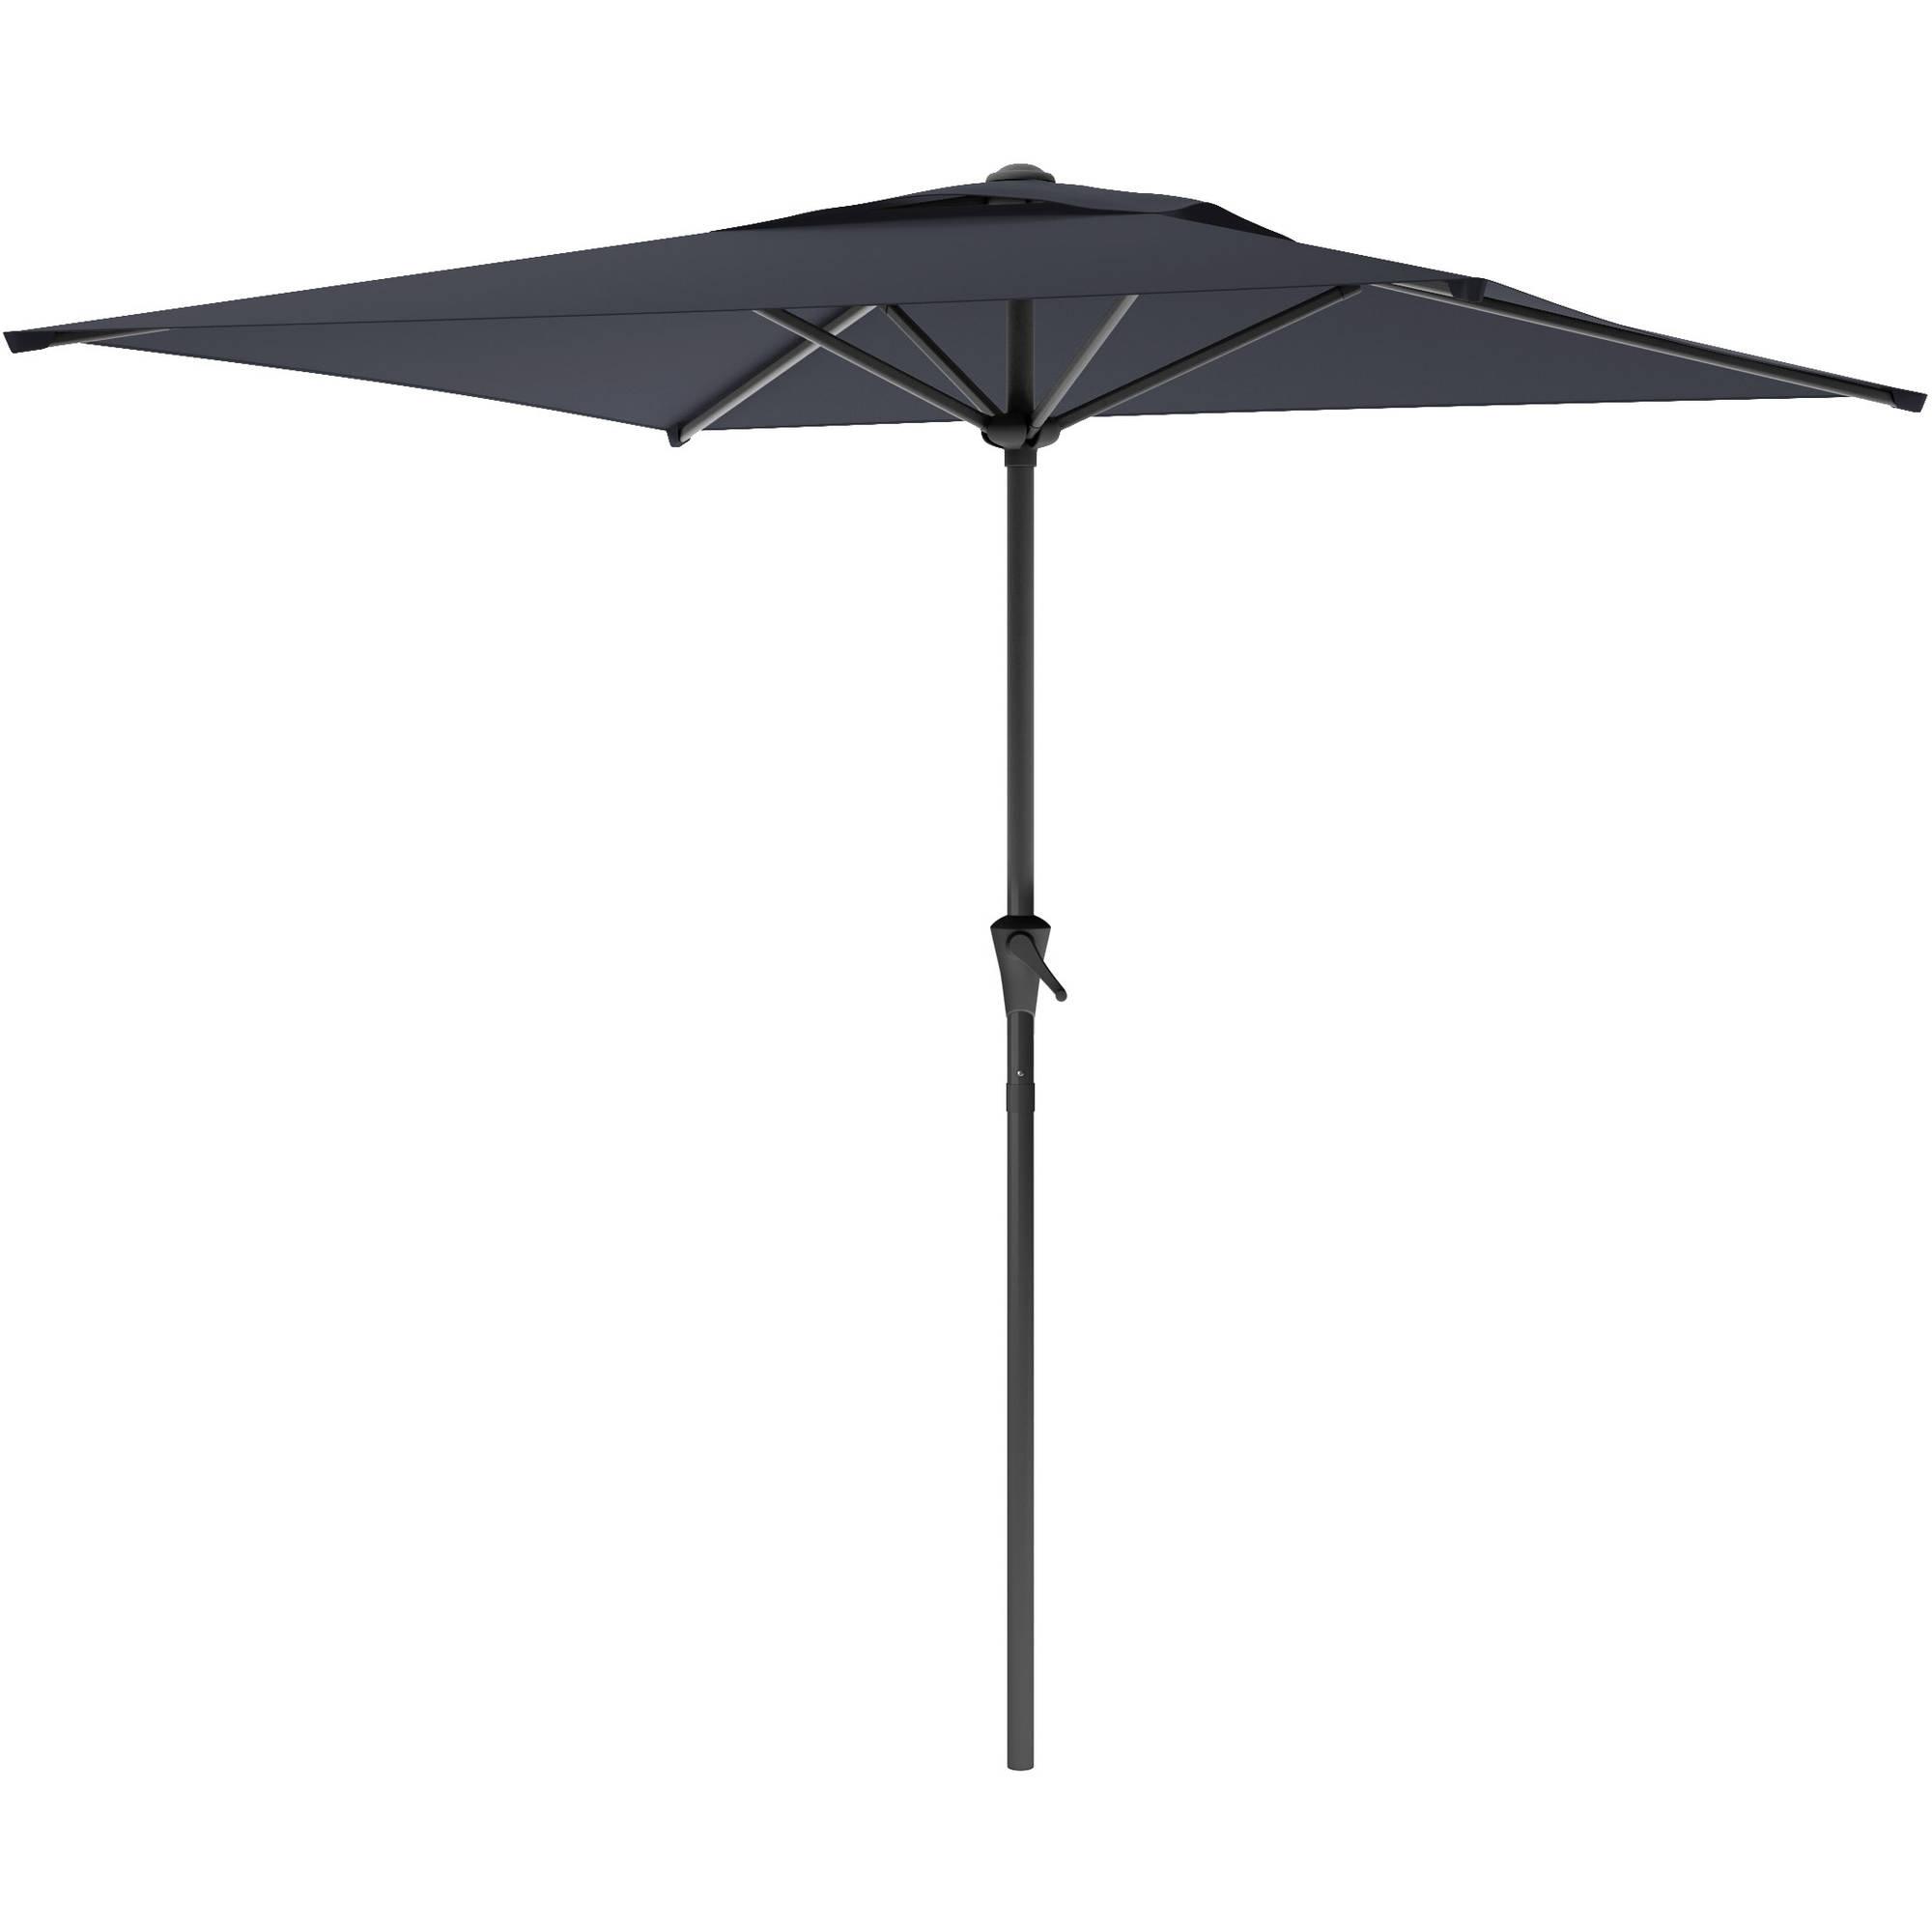 Favorite Sonax Corliving Square Patio Umbrella Metal Umbrellas In Black (Gallery 18 of 20)